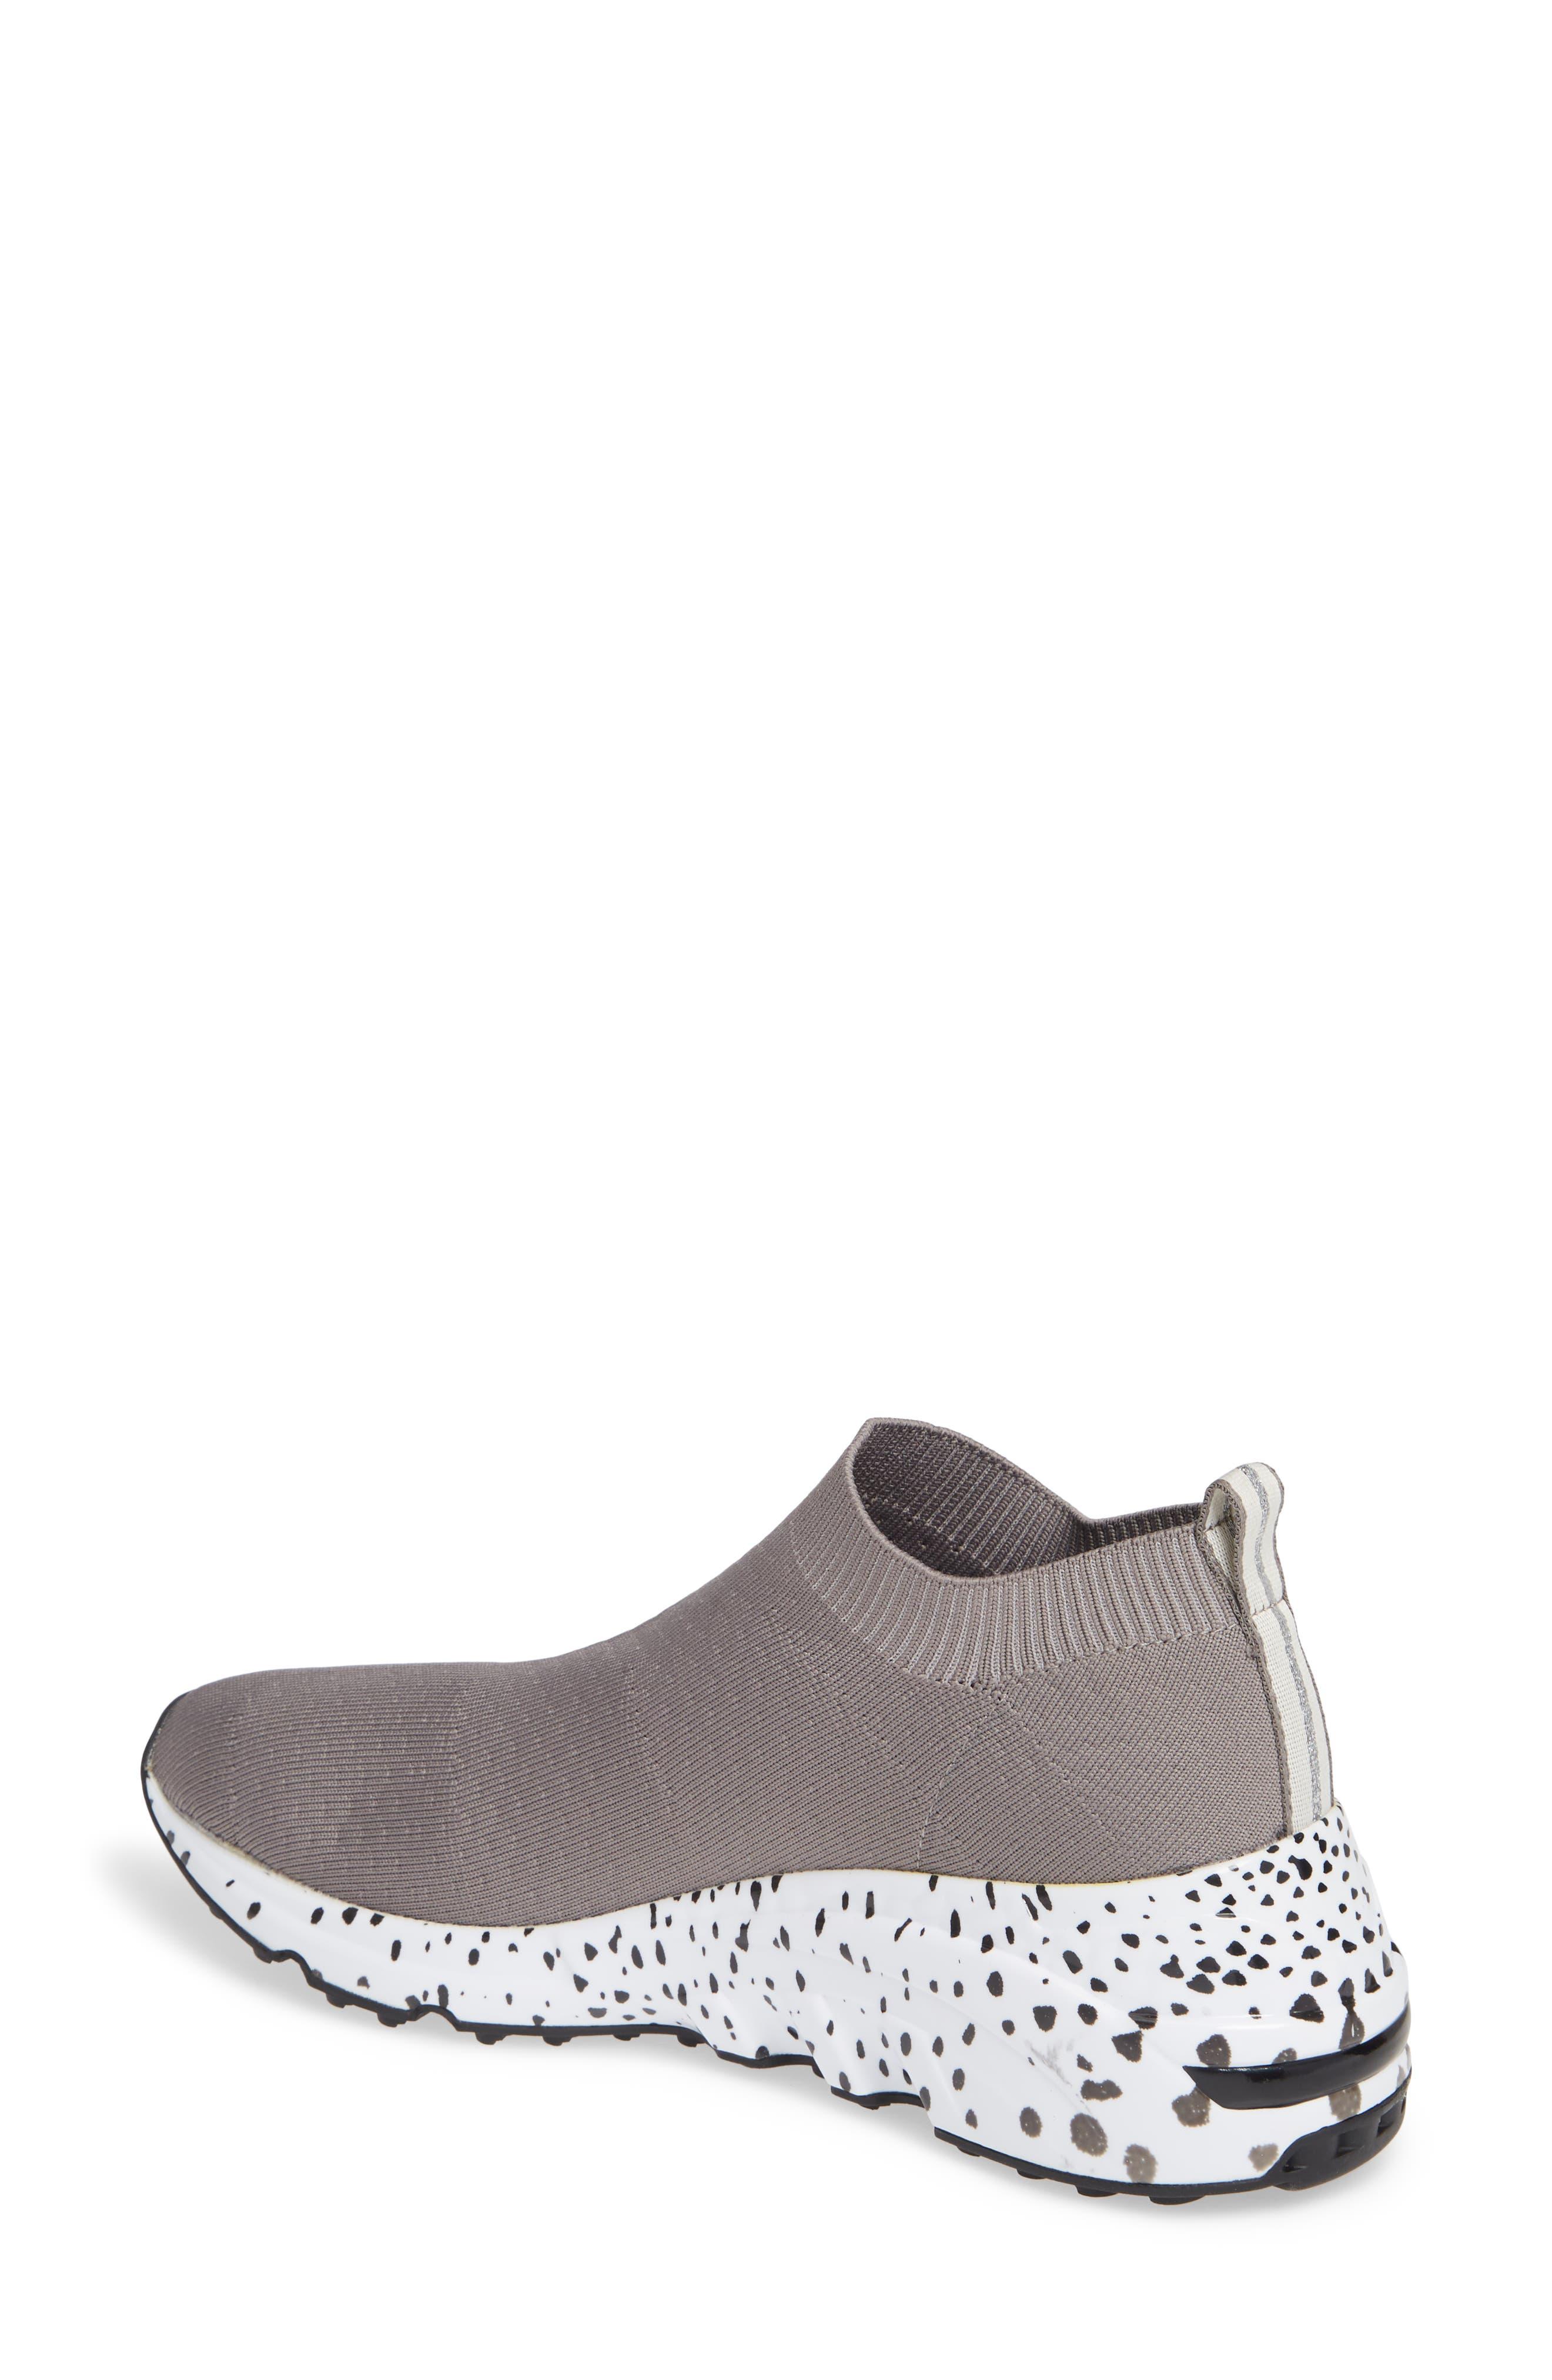 Cloud Sock Wedge Sneaker,                             Alternate thumbnail 2, color,                             GREY